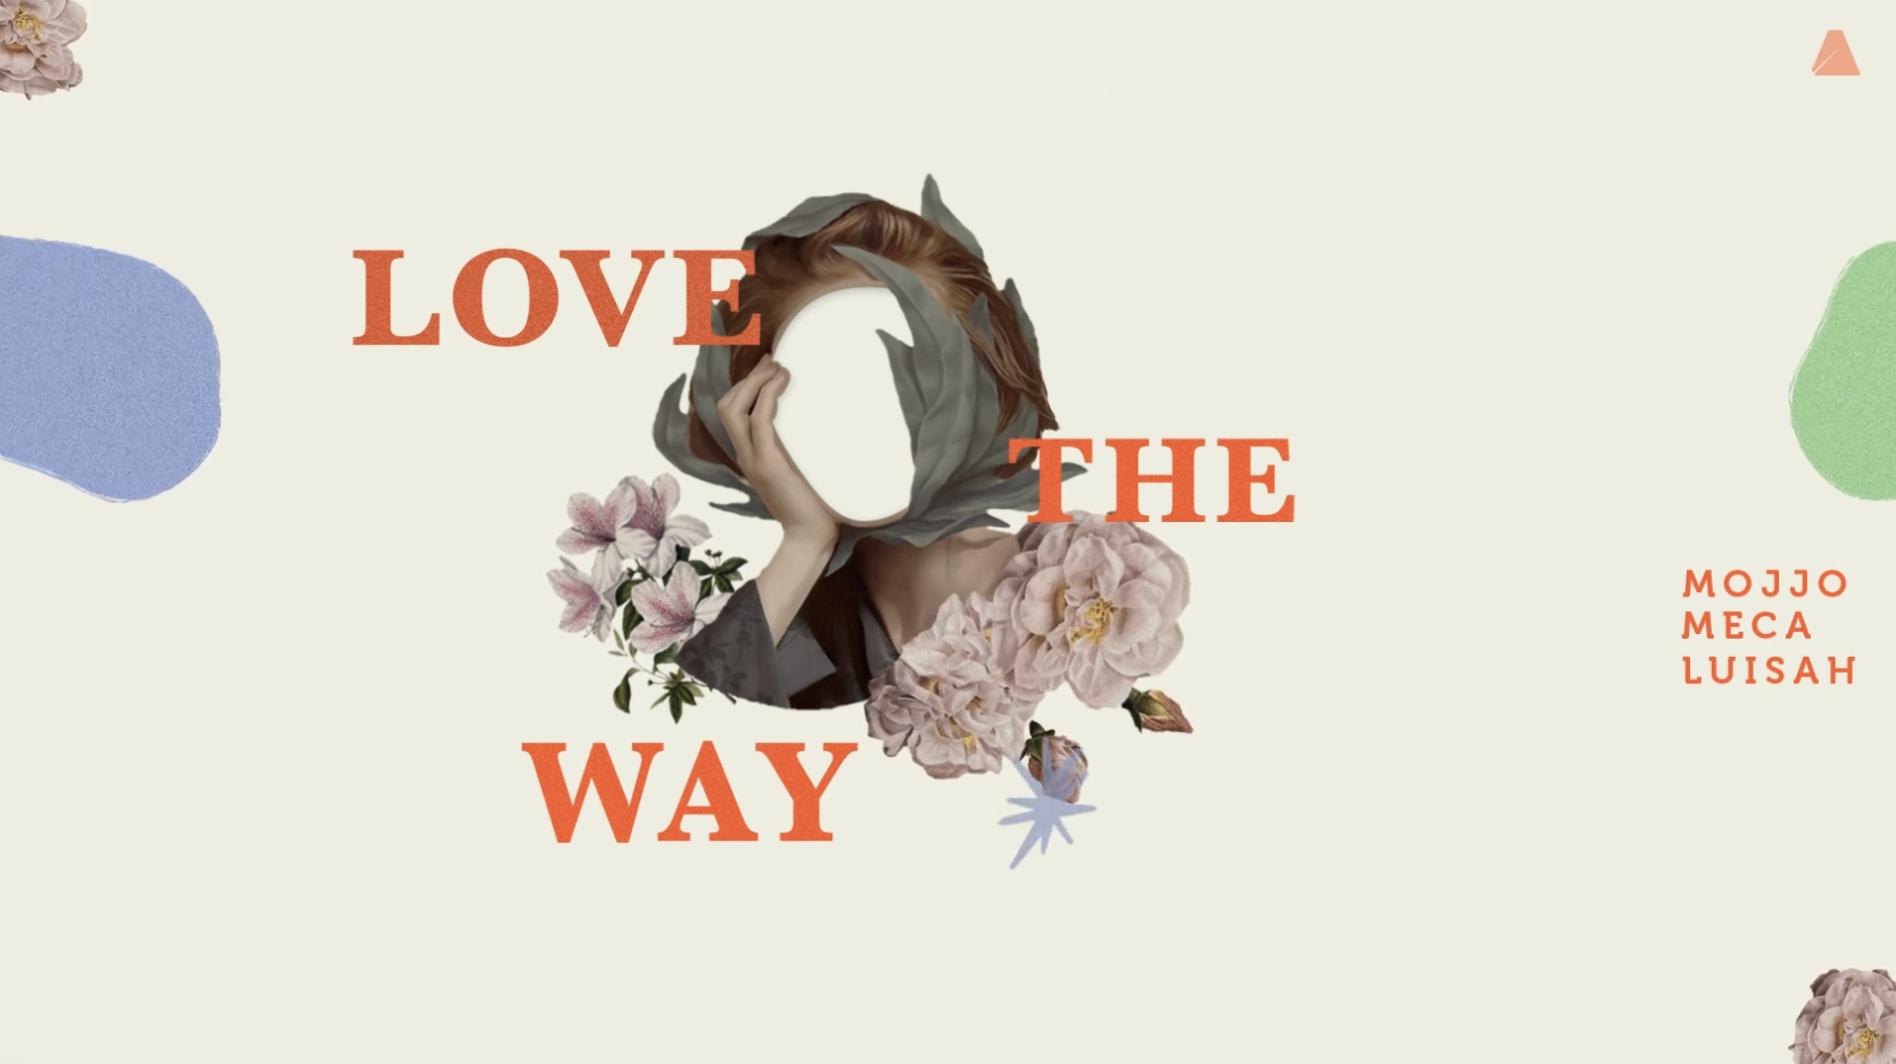 Cover: Mojjo, Meca, LUISAH - Love The Way